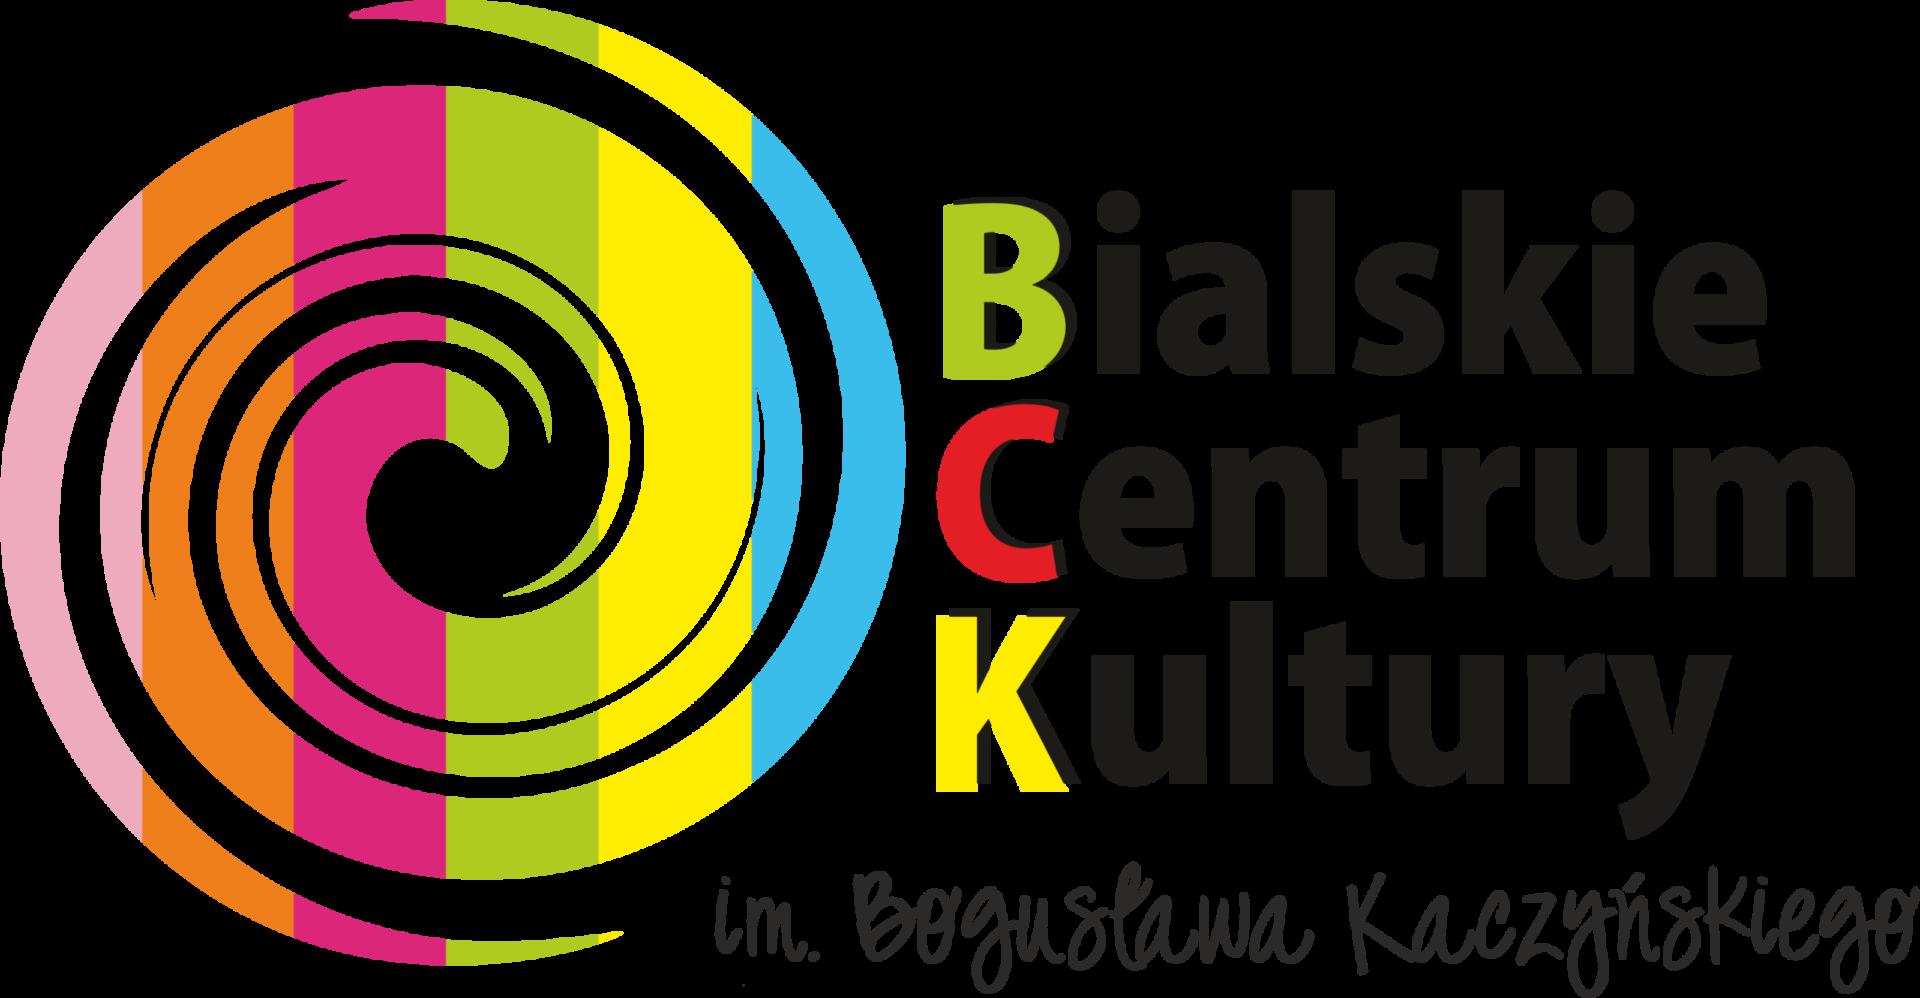 BCK24 | Bialskie Centrum Kultury